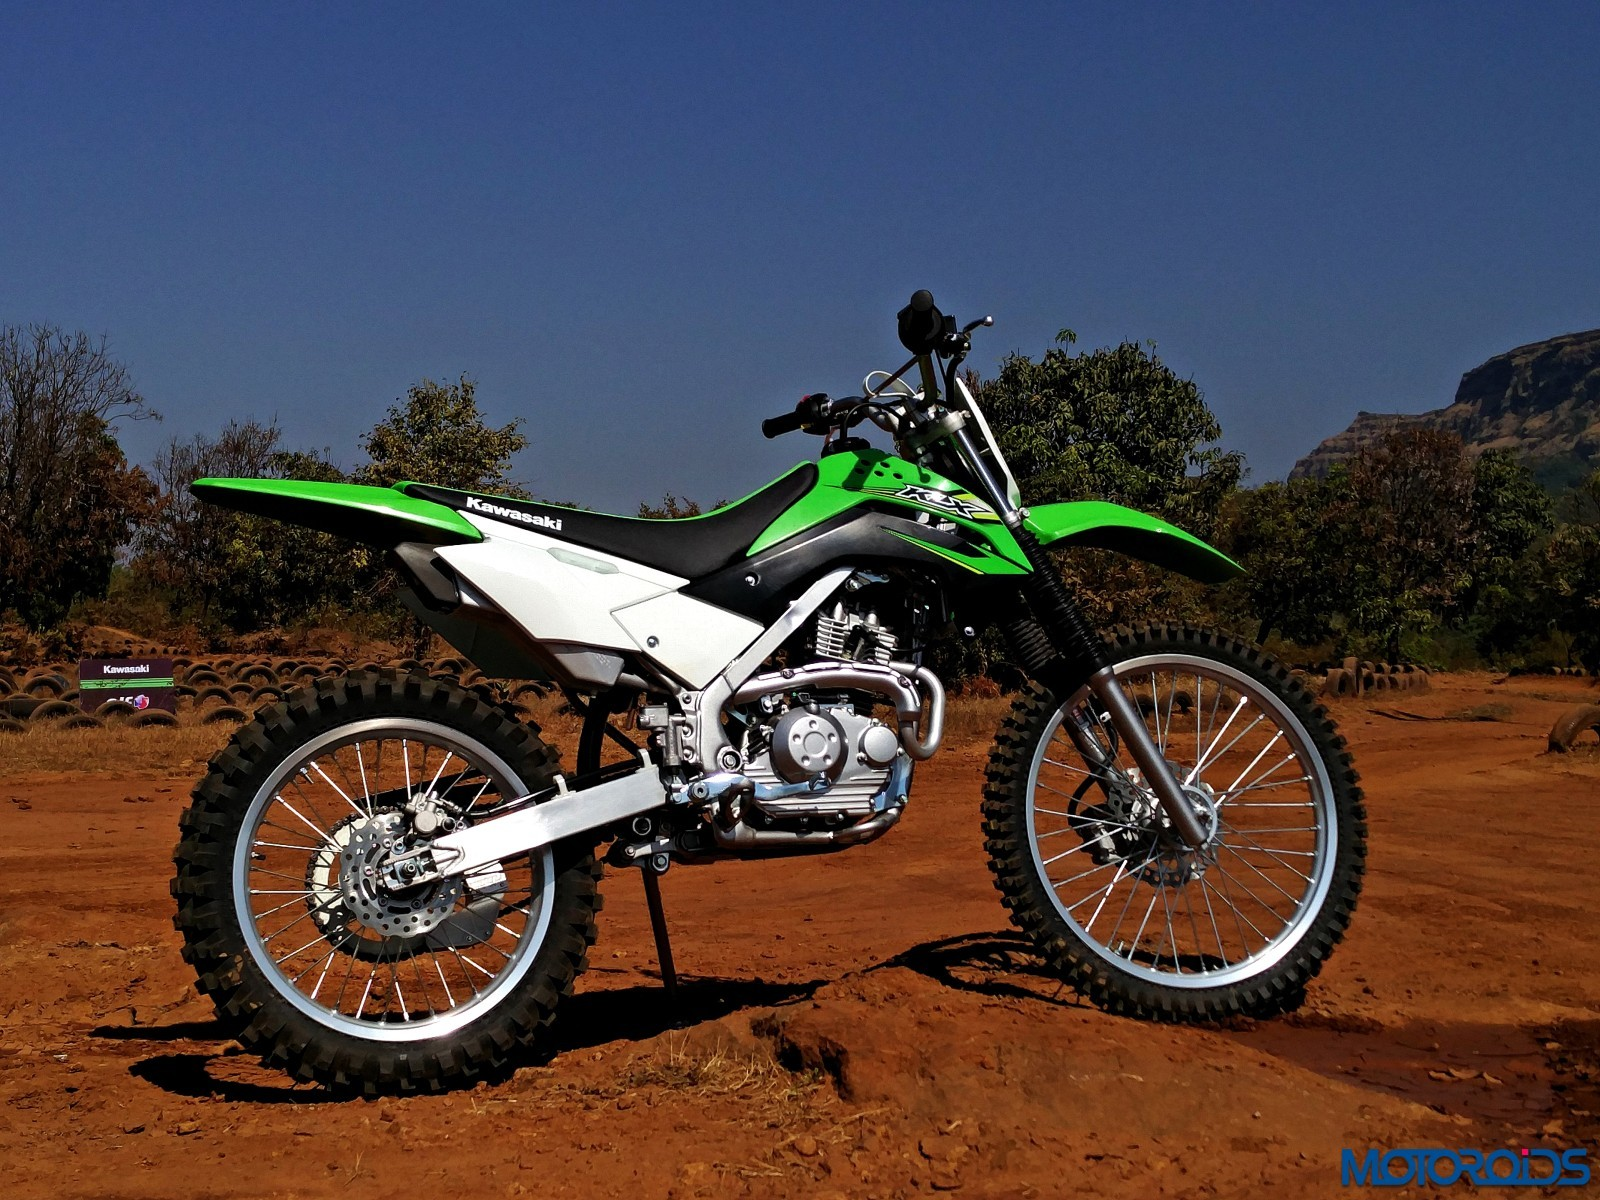 Kawasaki-KLX140G-Ride-Experience-35